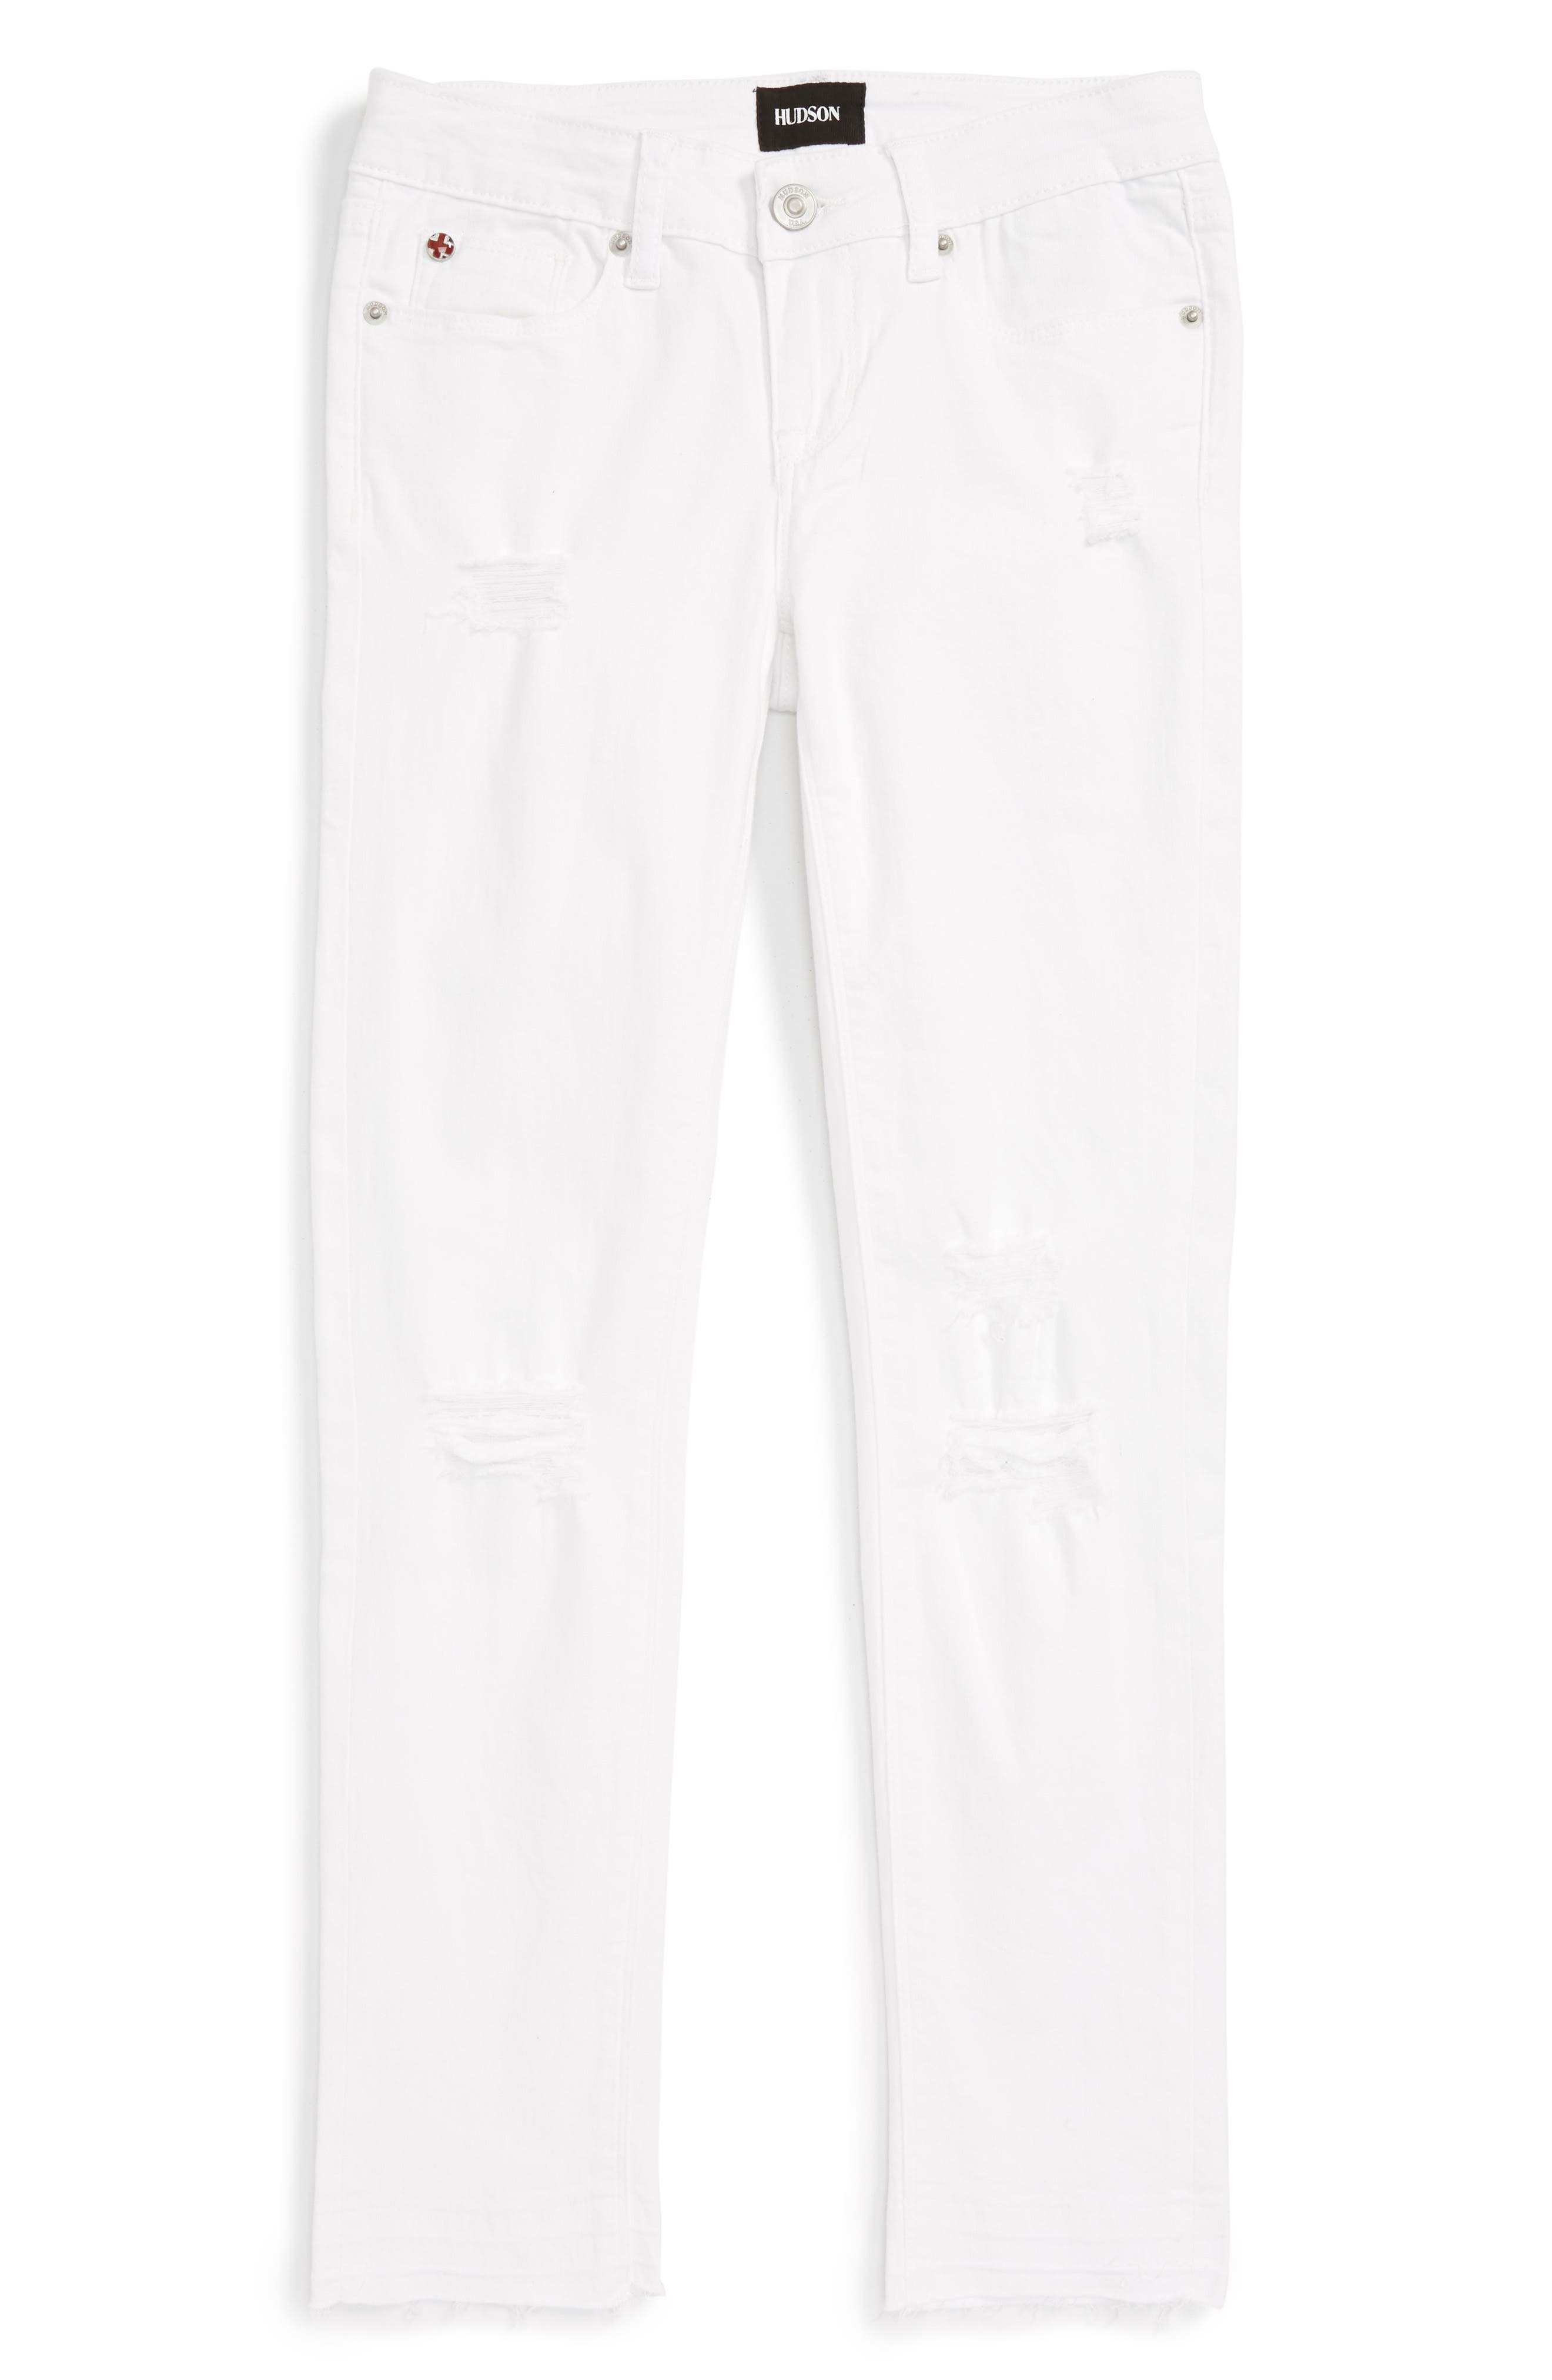 Seaside Crop Skinny Jeans,                             Main thumbnail 1, color,                             100